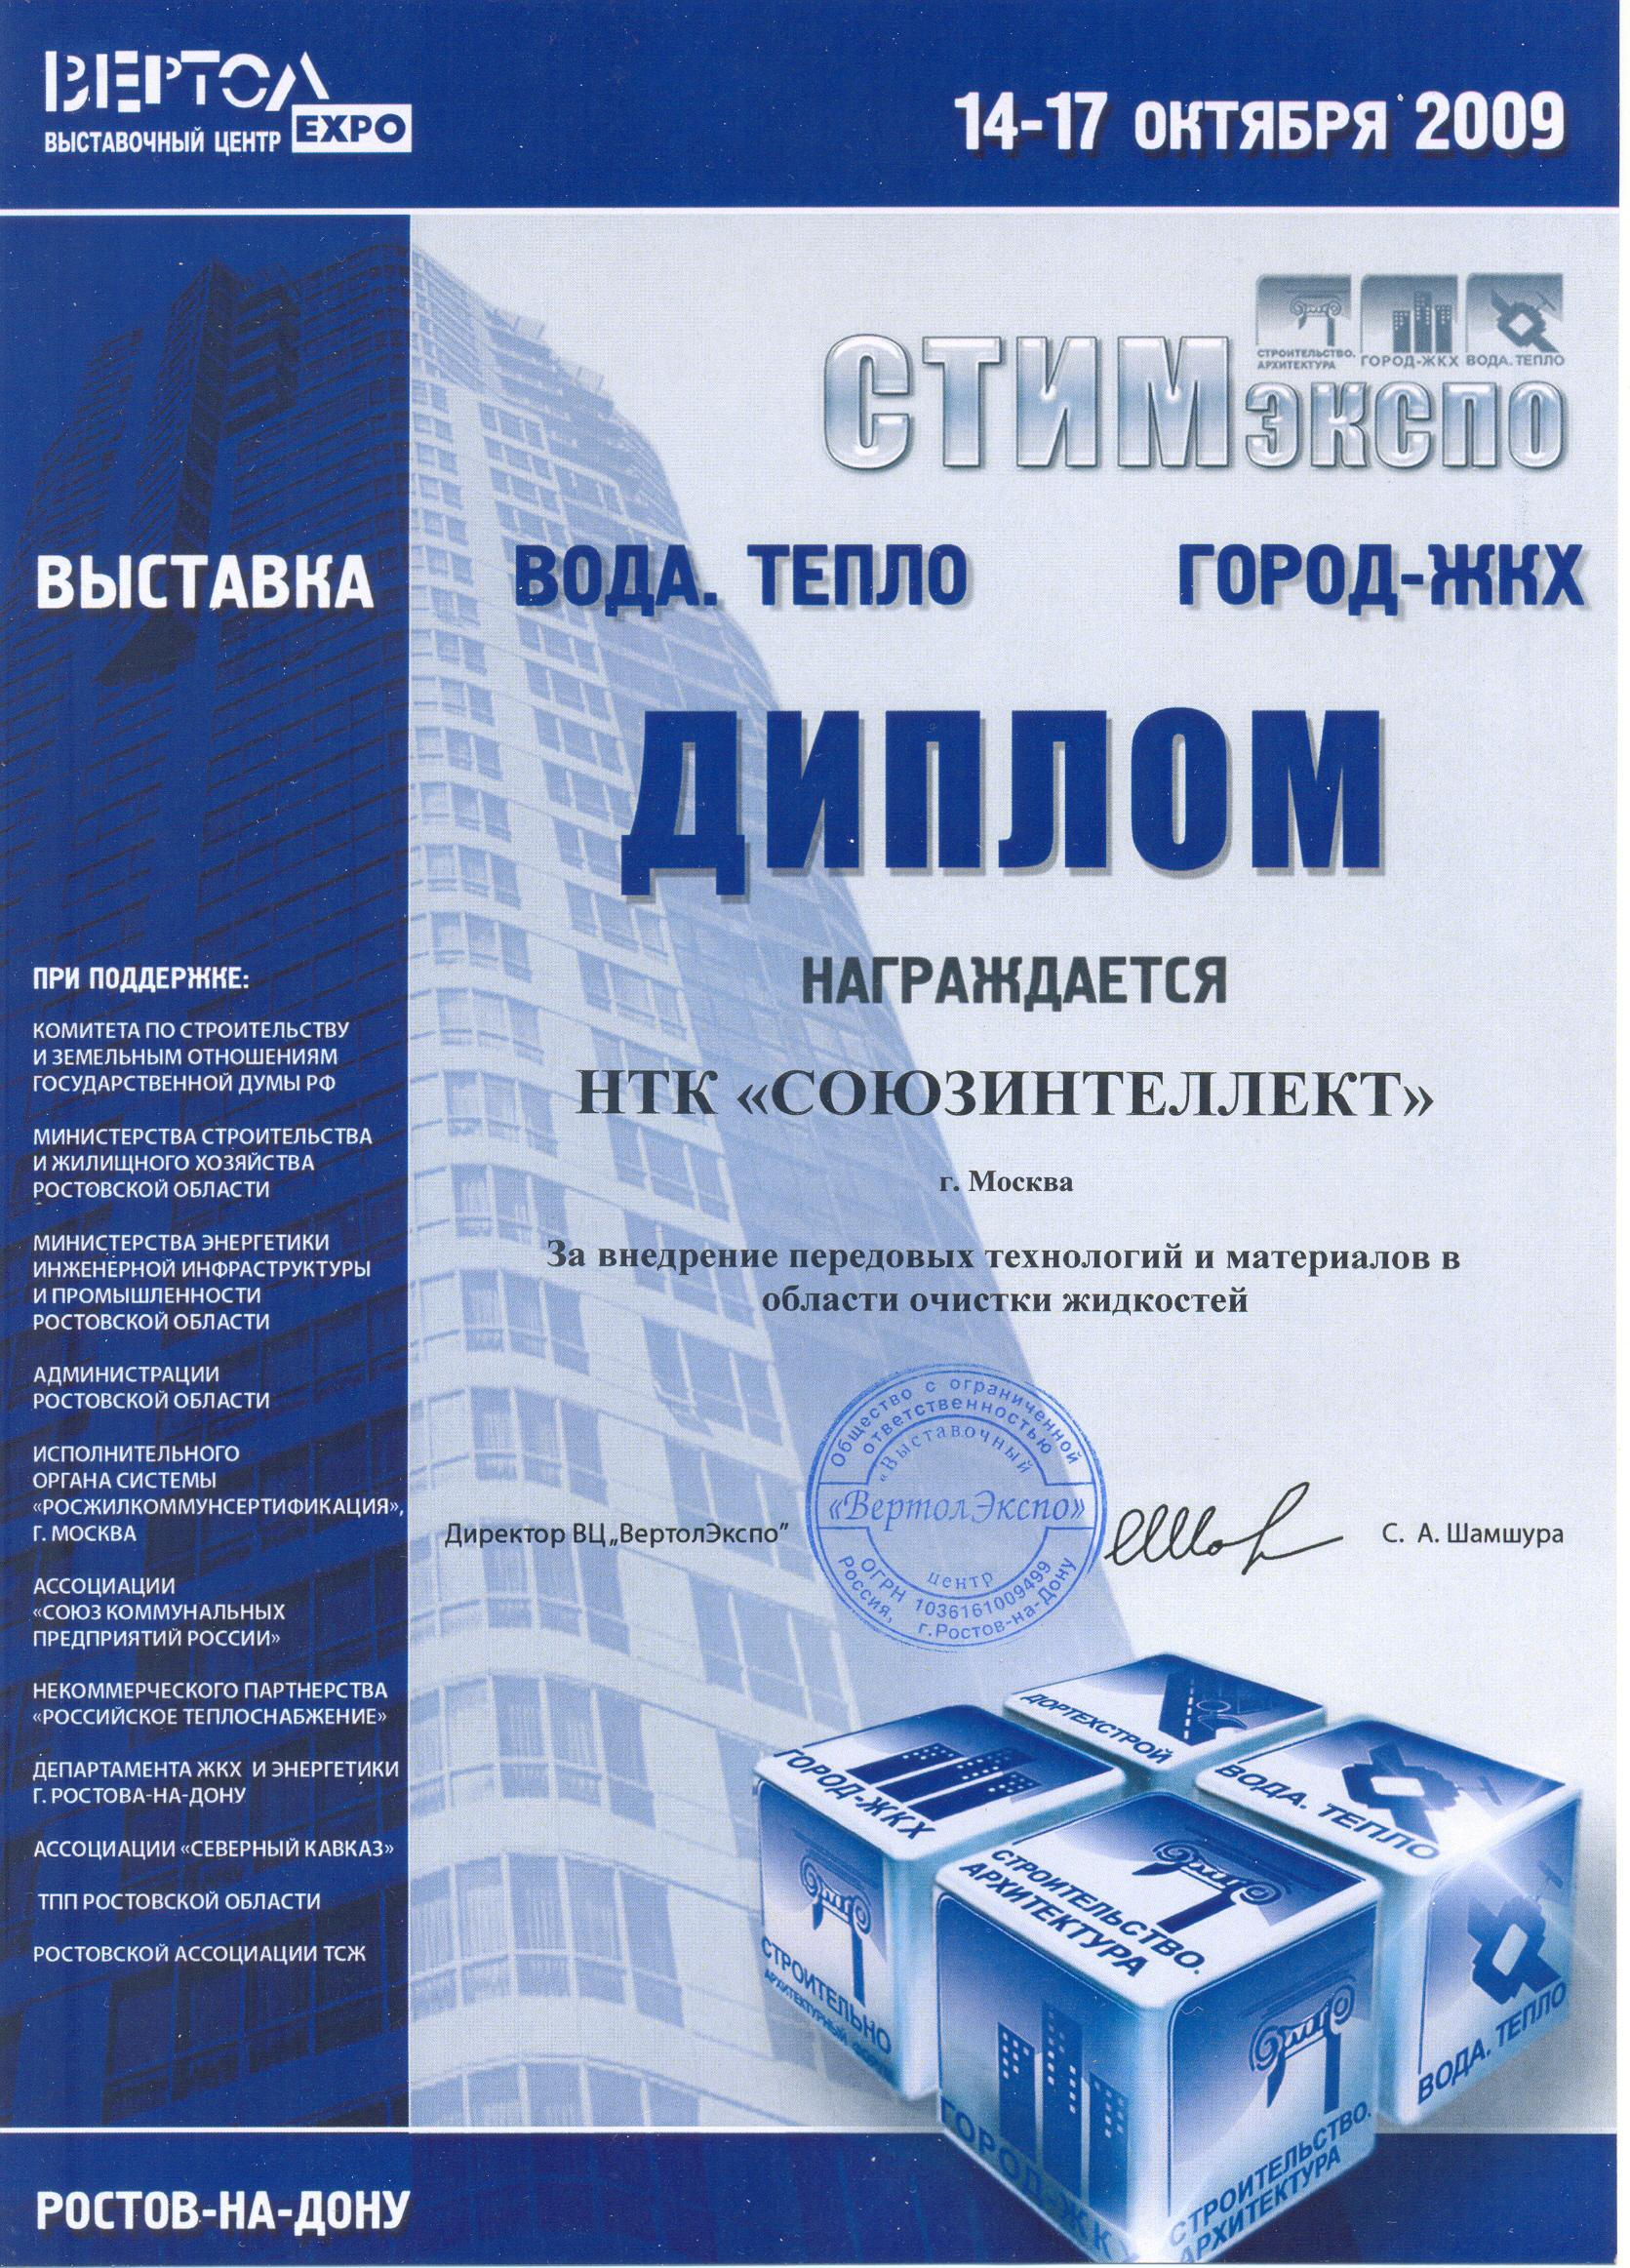 http://souzintellekt.ru/images/upload/RostovVertolL.jpg